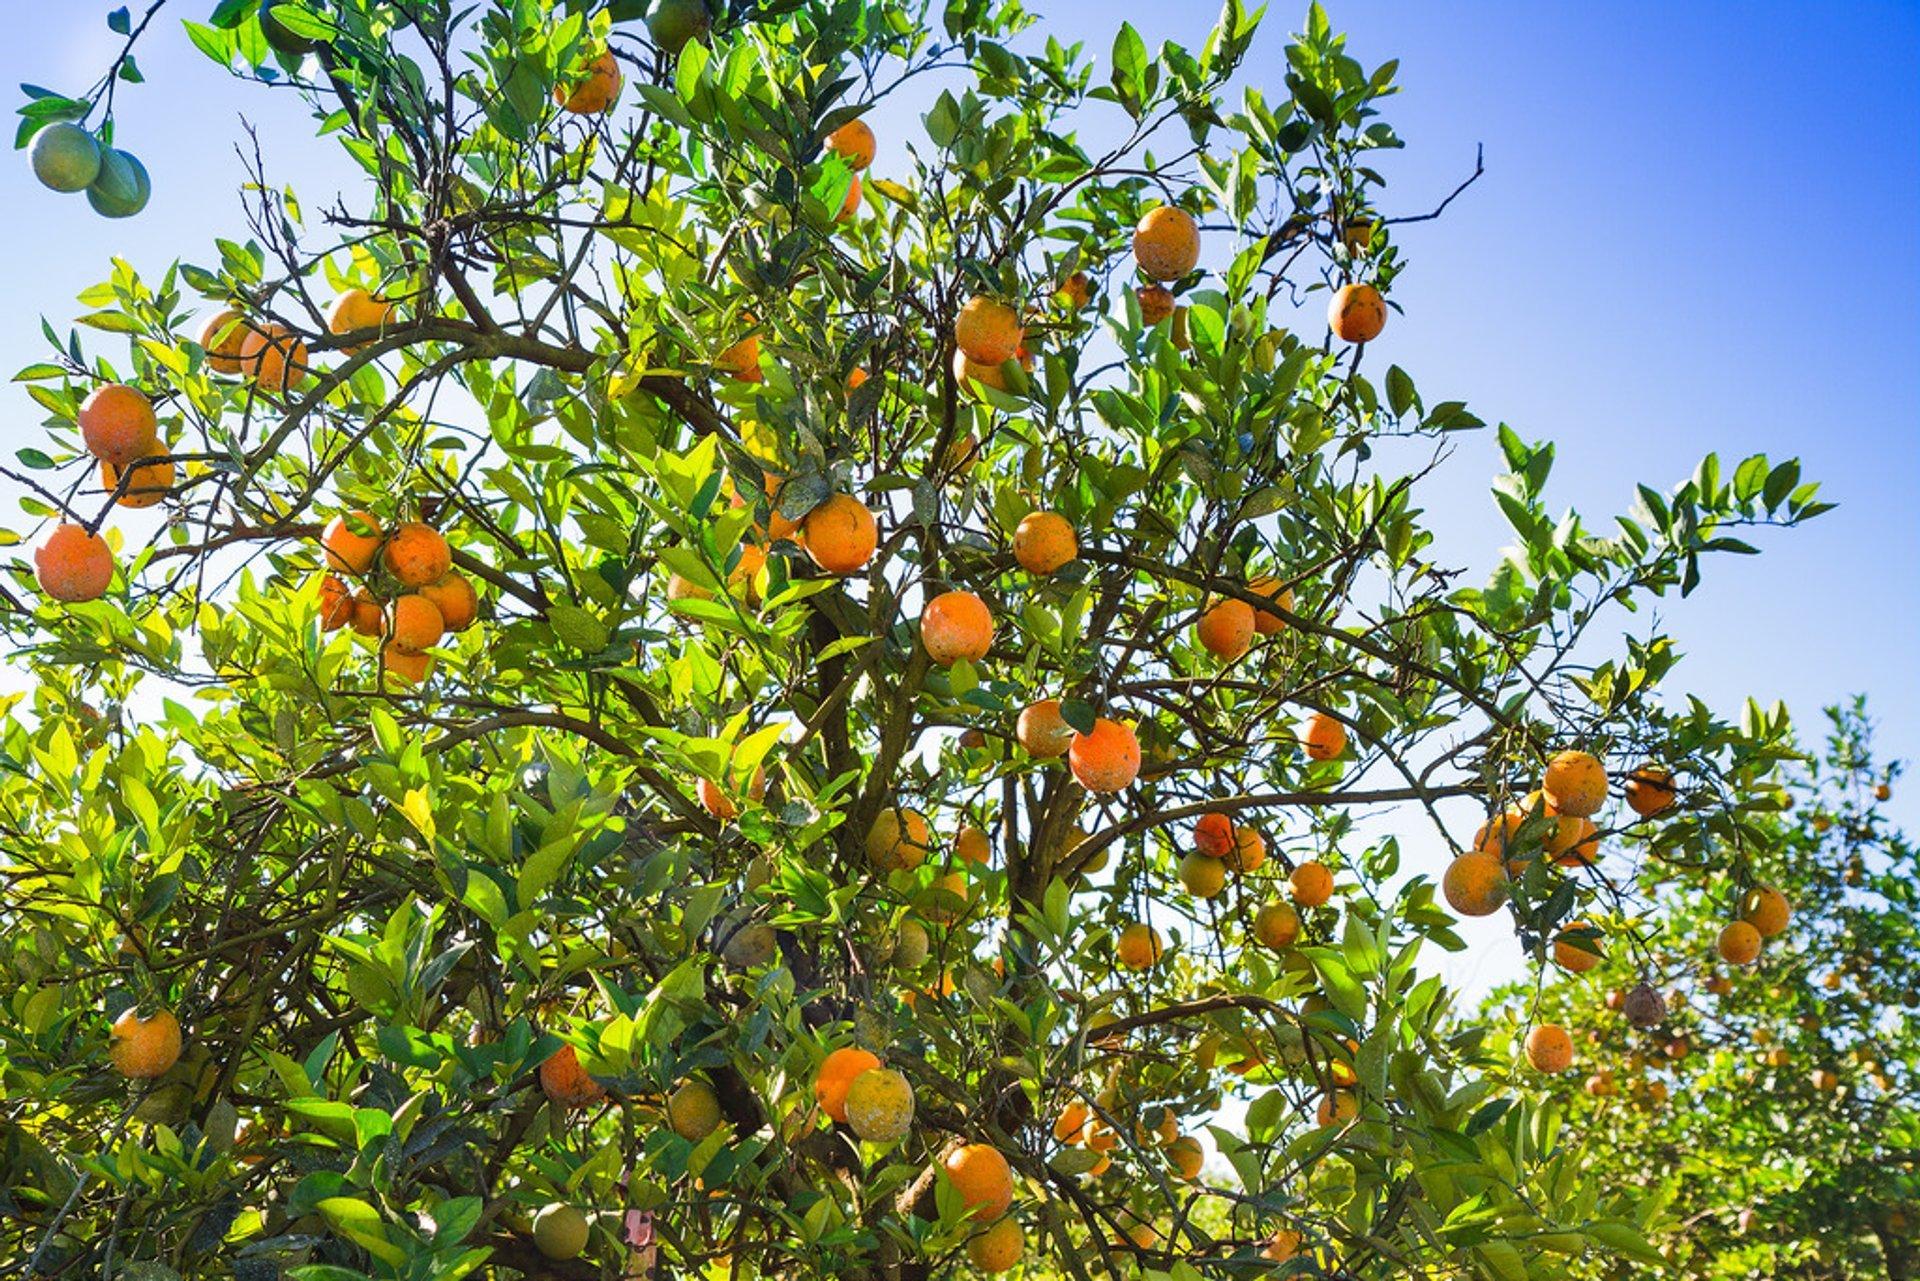 Citrus Season in Florida 2019 - Best Time